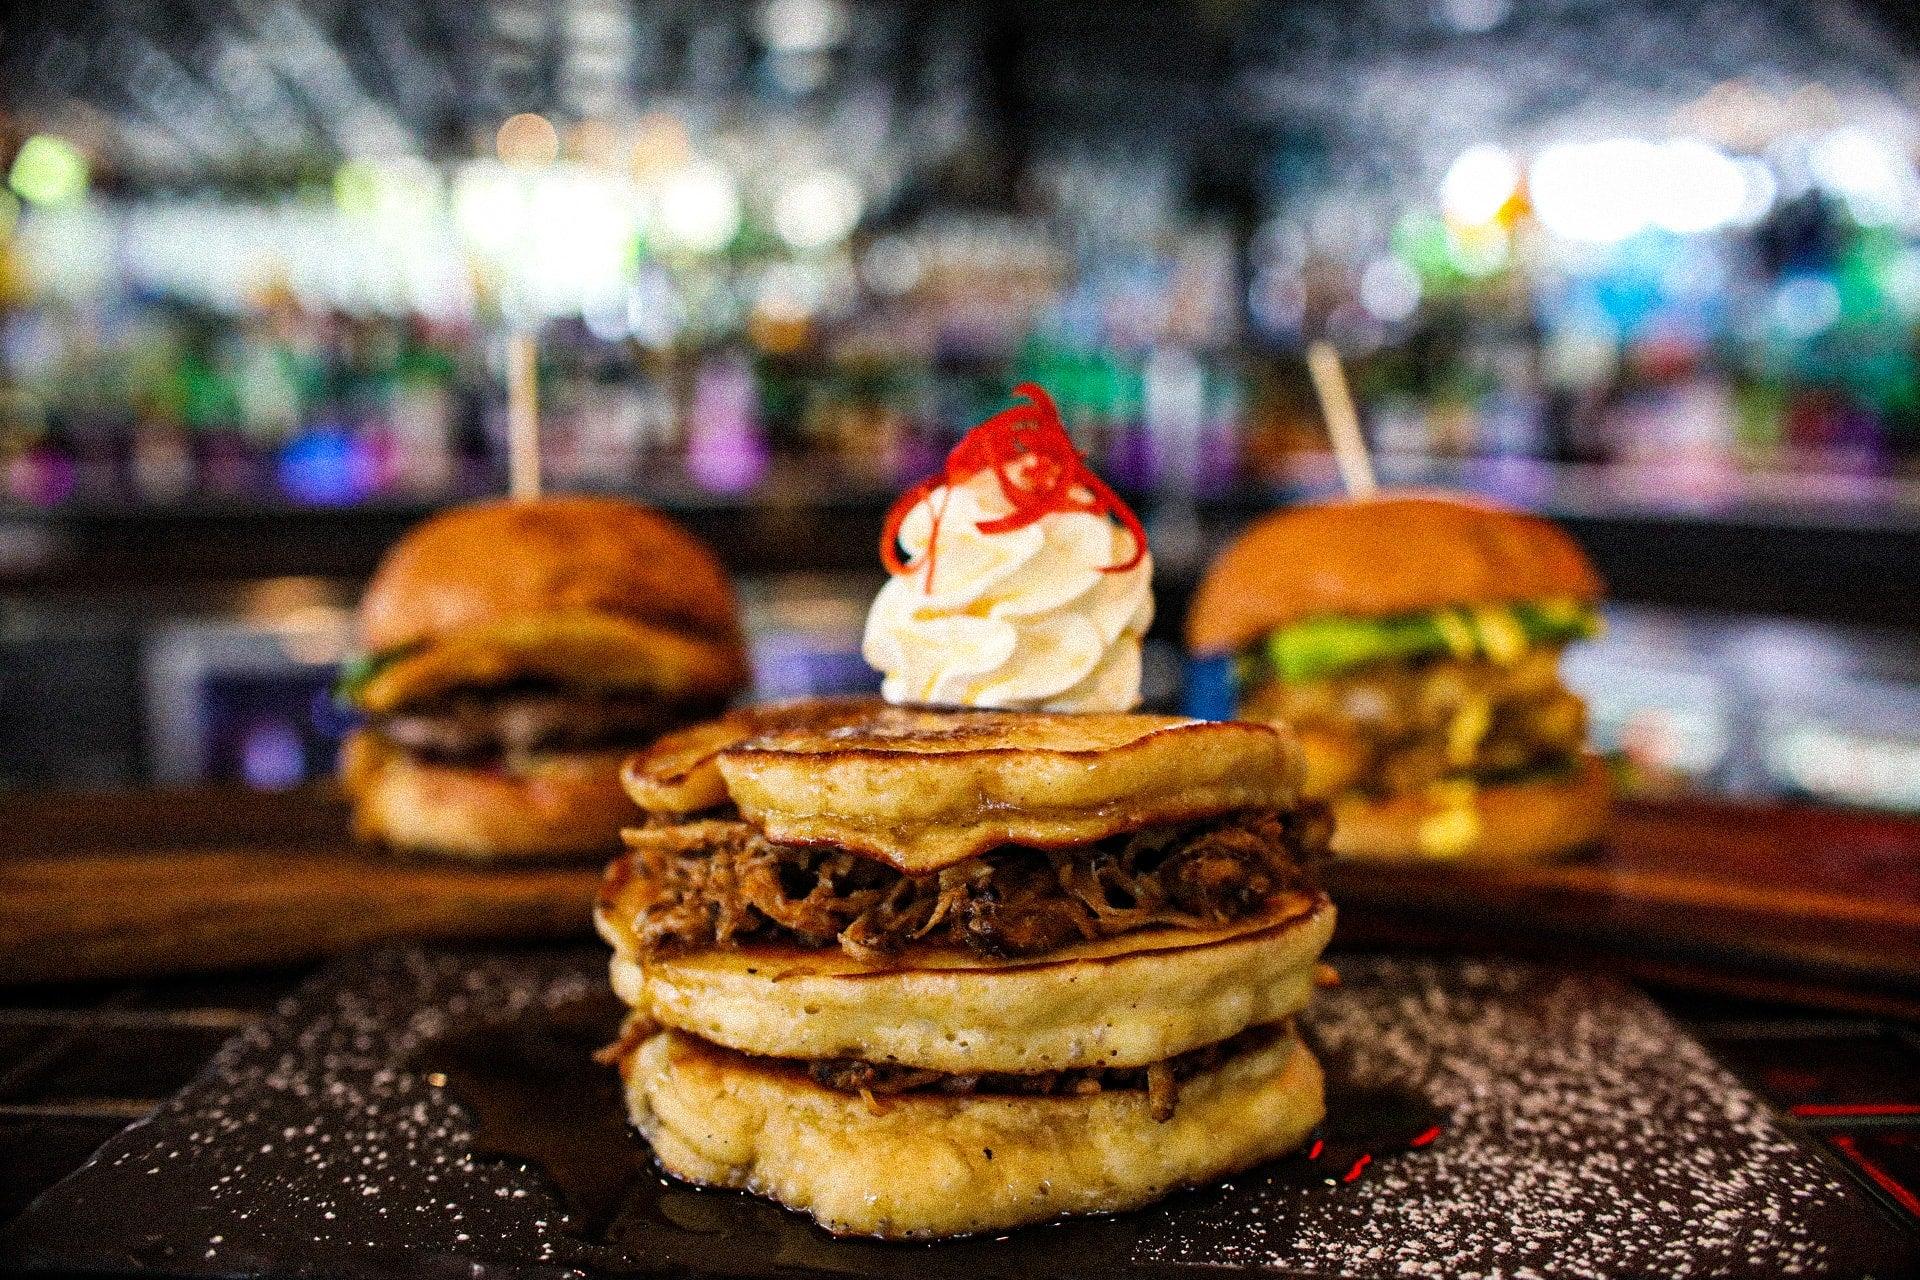 Burgers and Pulled Pork Pancakes Goodbar Mooloolaba